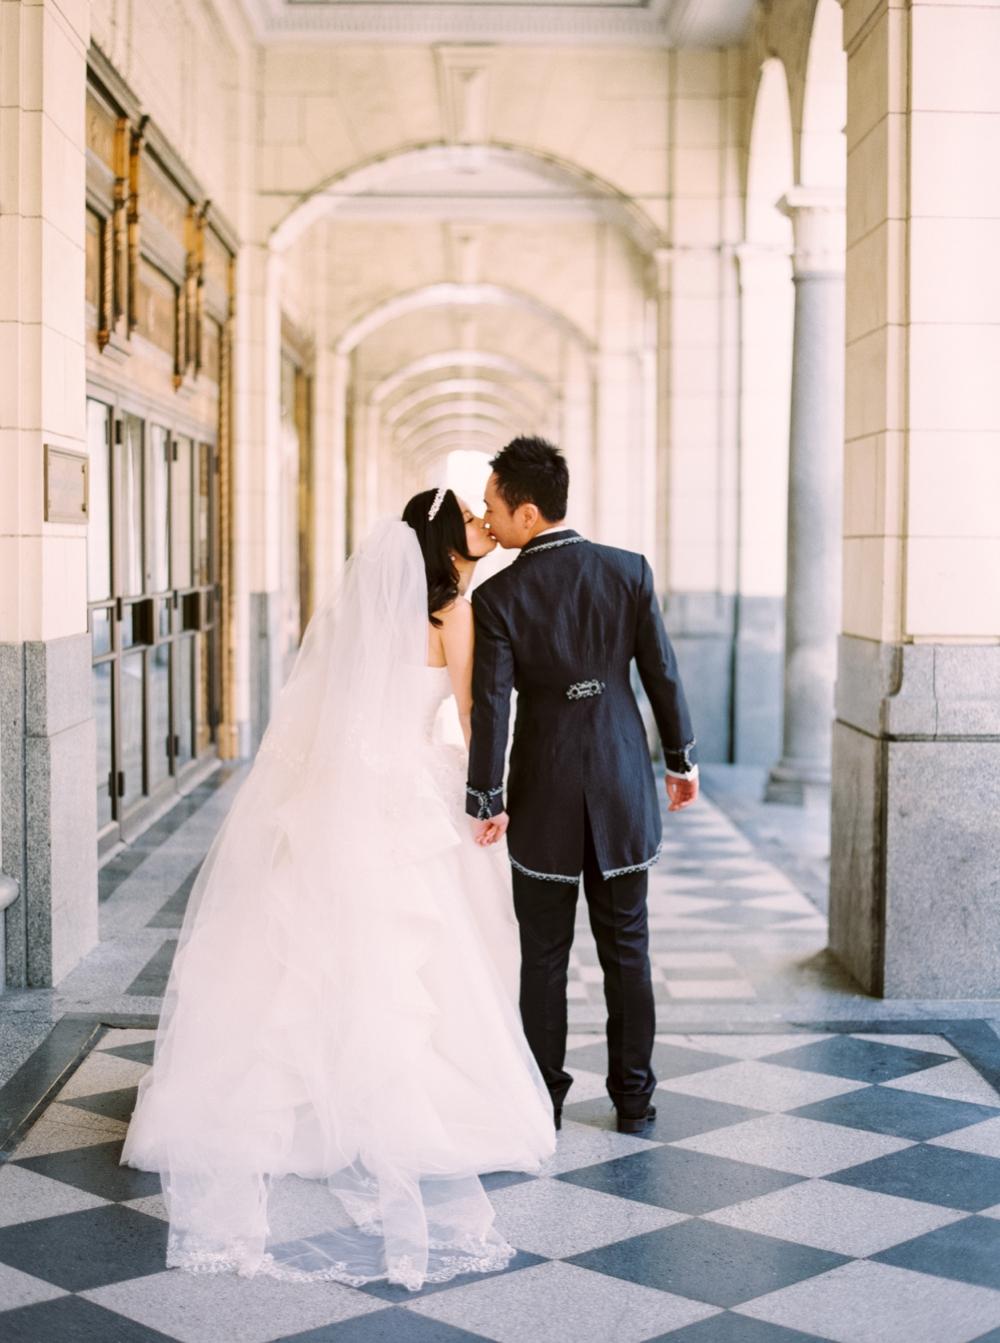 Calgary Wedding Photographers | Lynx Ridge Golf Course Wedding | Justine Milton PhotographyCalgary Wedding Photographers | Lynx Ridge Golf Course Wedding | Justine Milton Photography